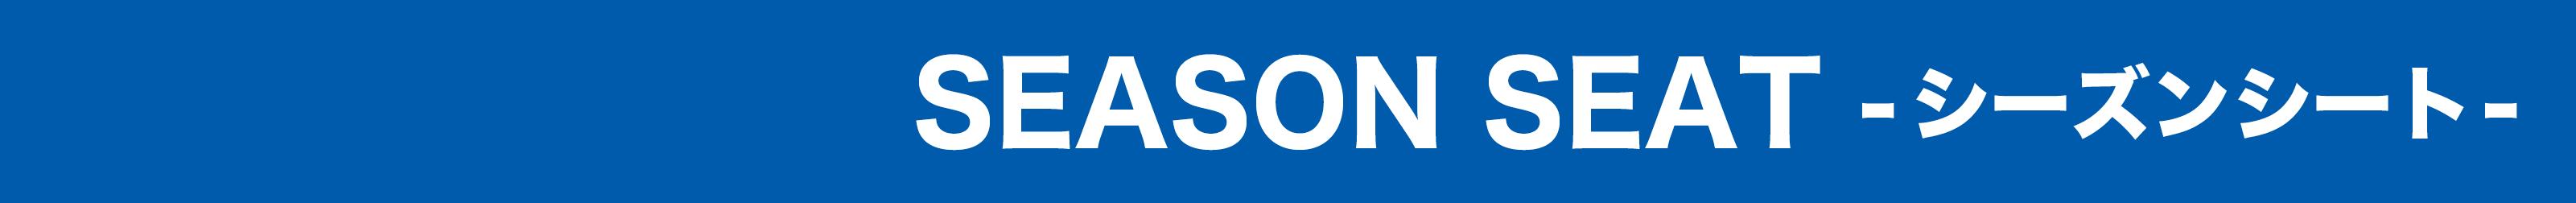 SEASON SEAT